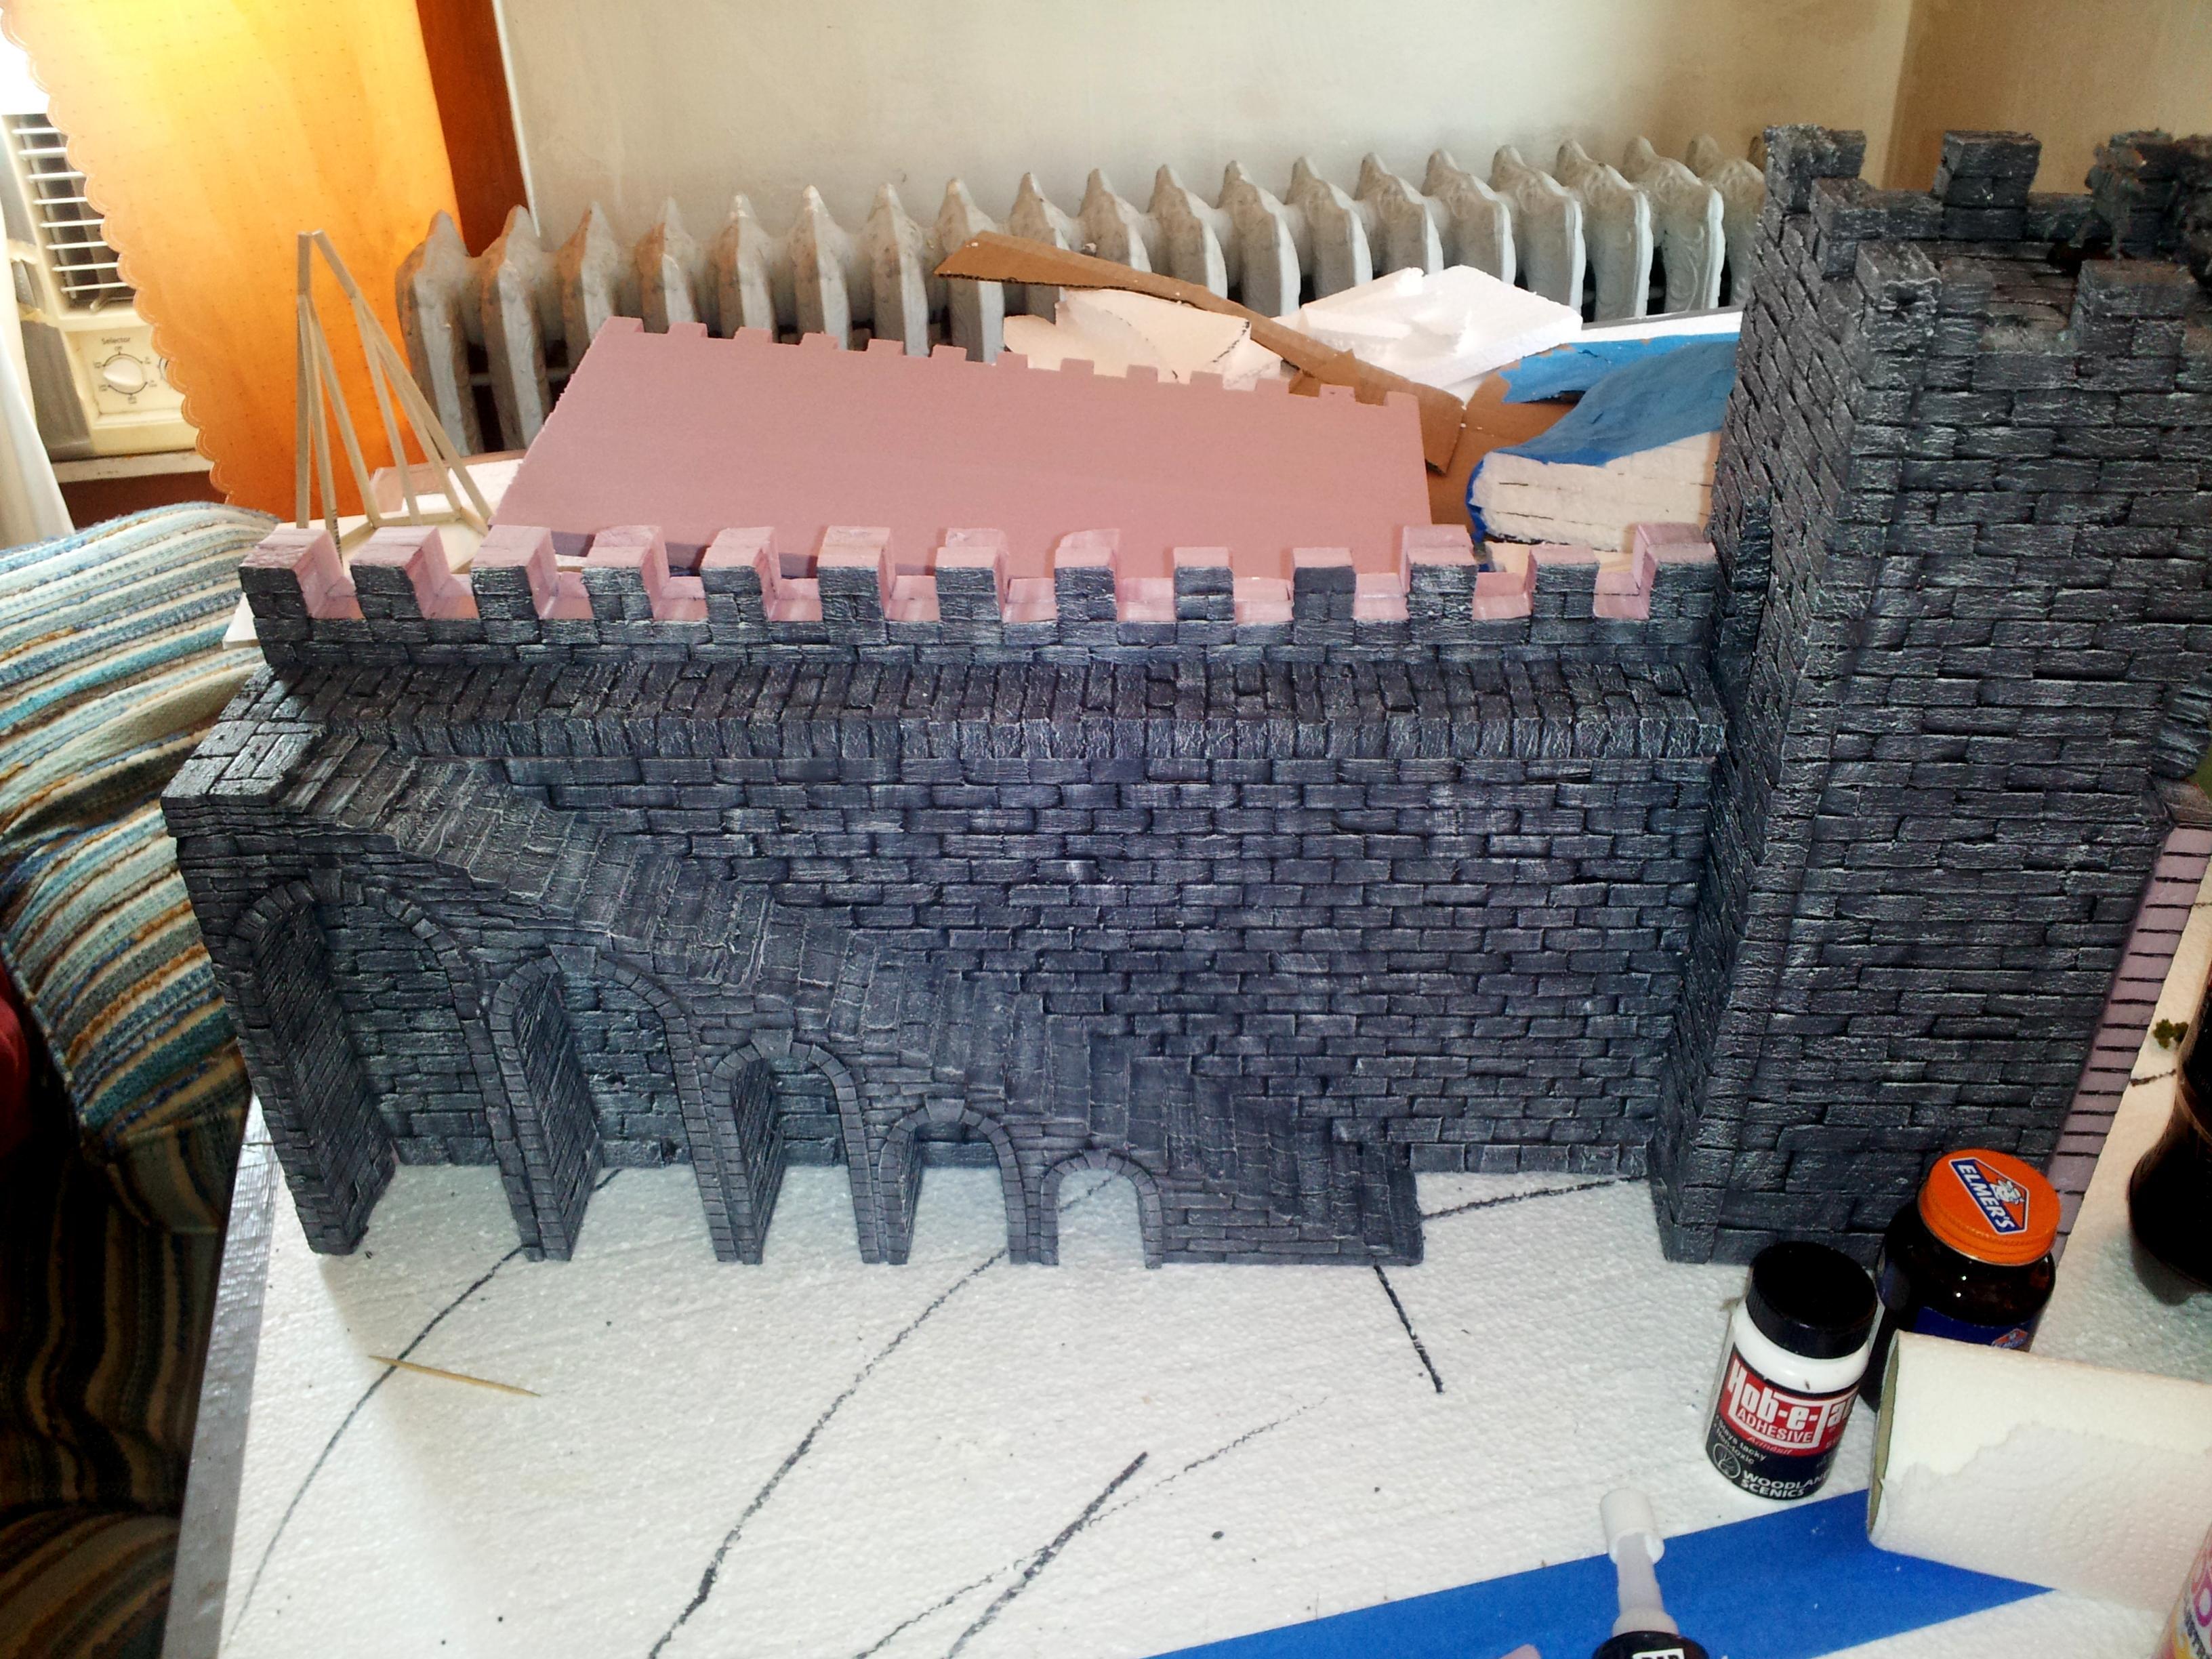 Terrain, Inner wall Near completion